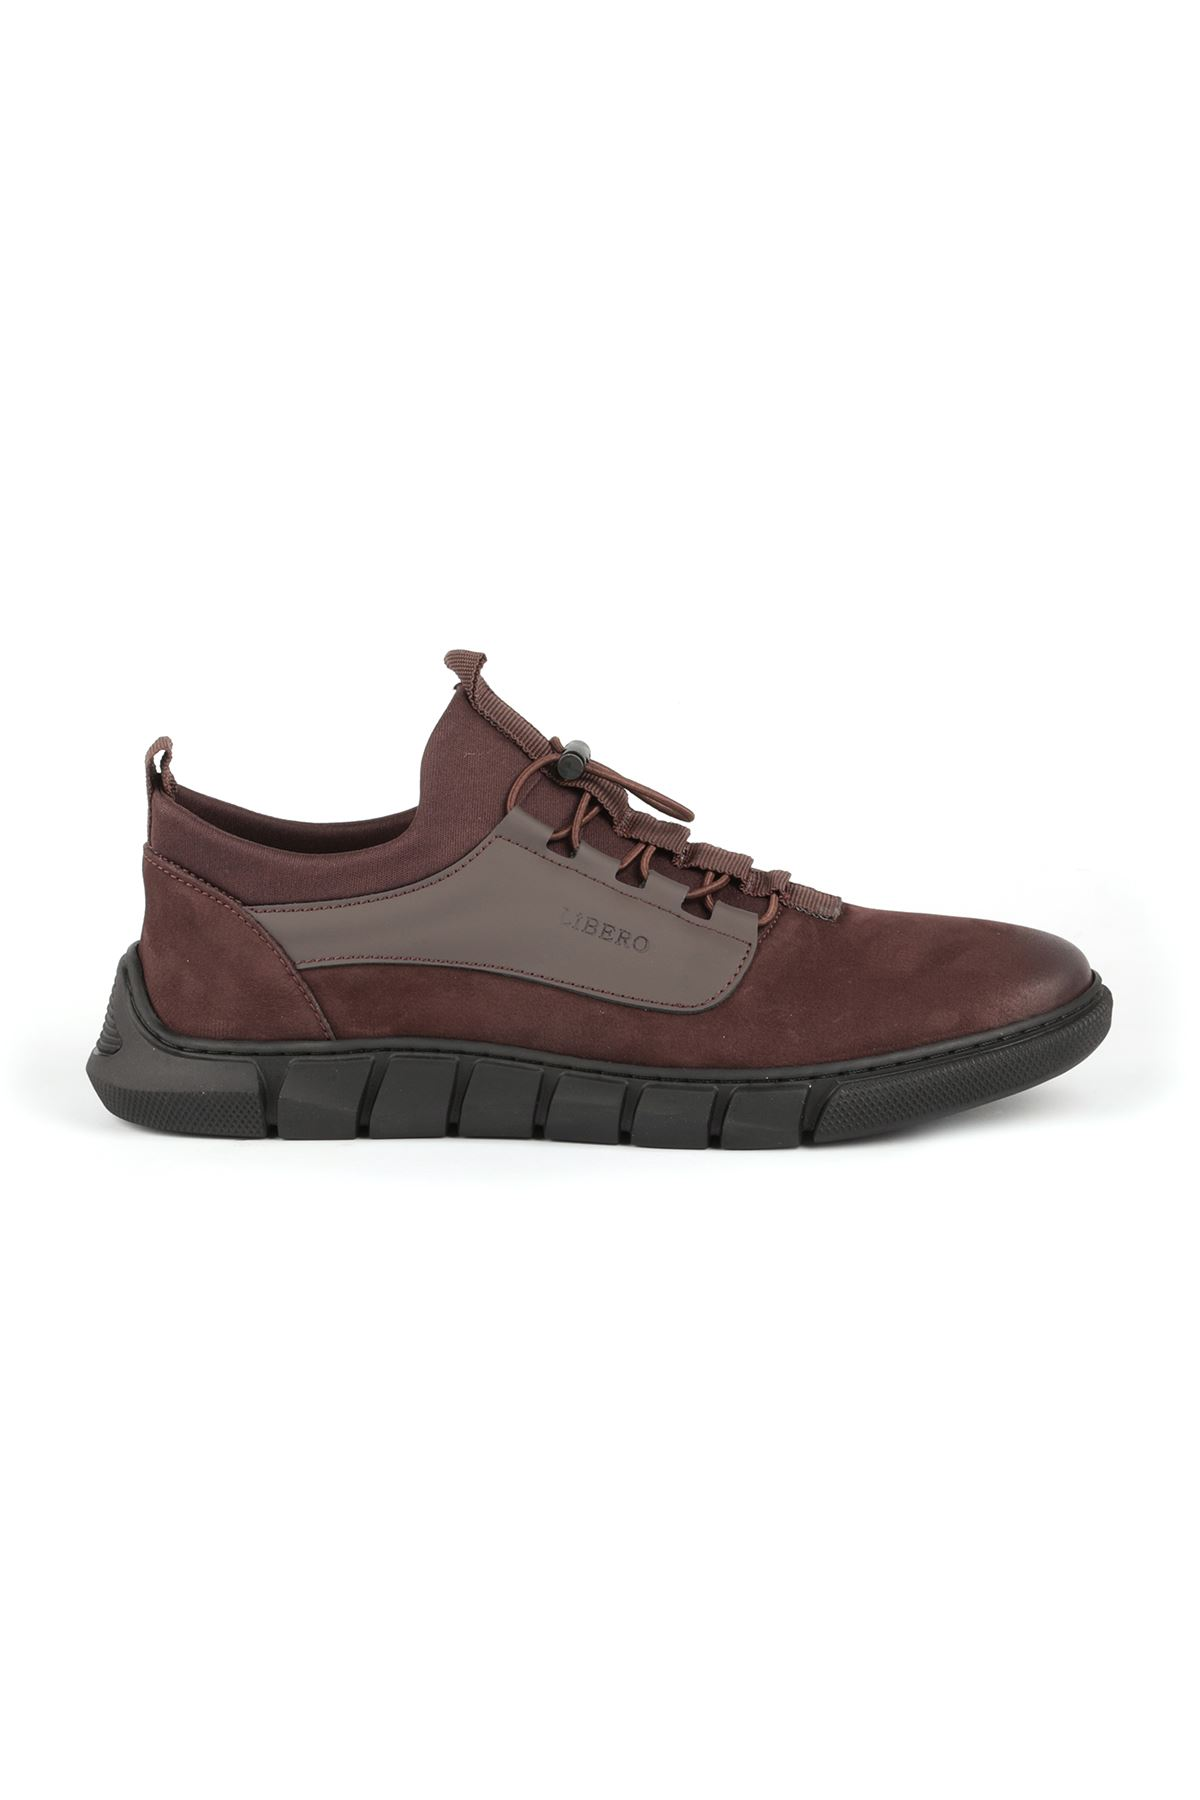 Libero L3589 Brown Sport Shoes